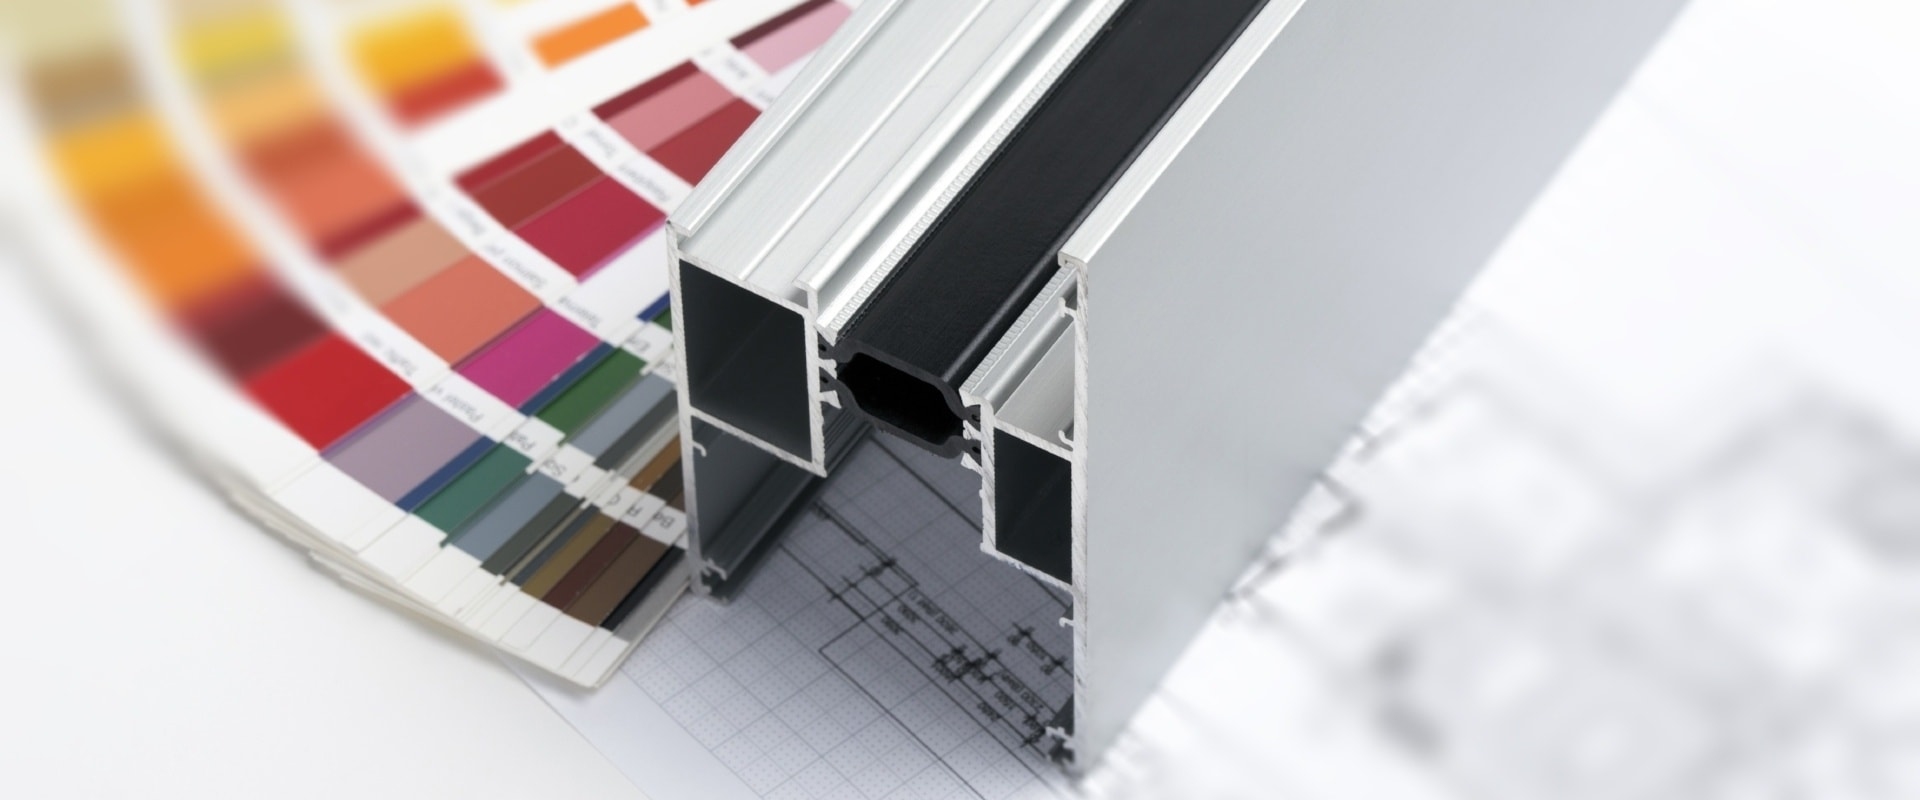 design_and_supply_banner-min.jpg